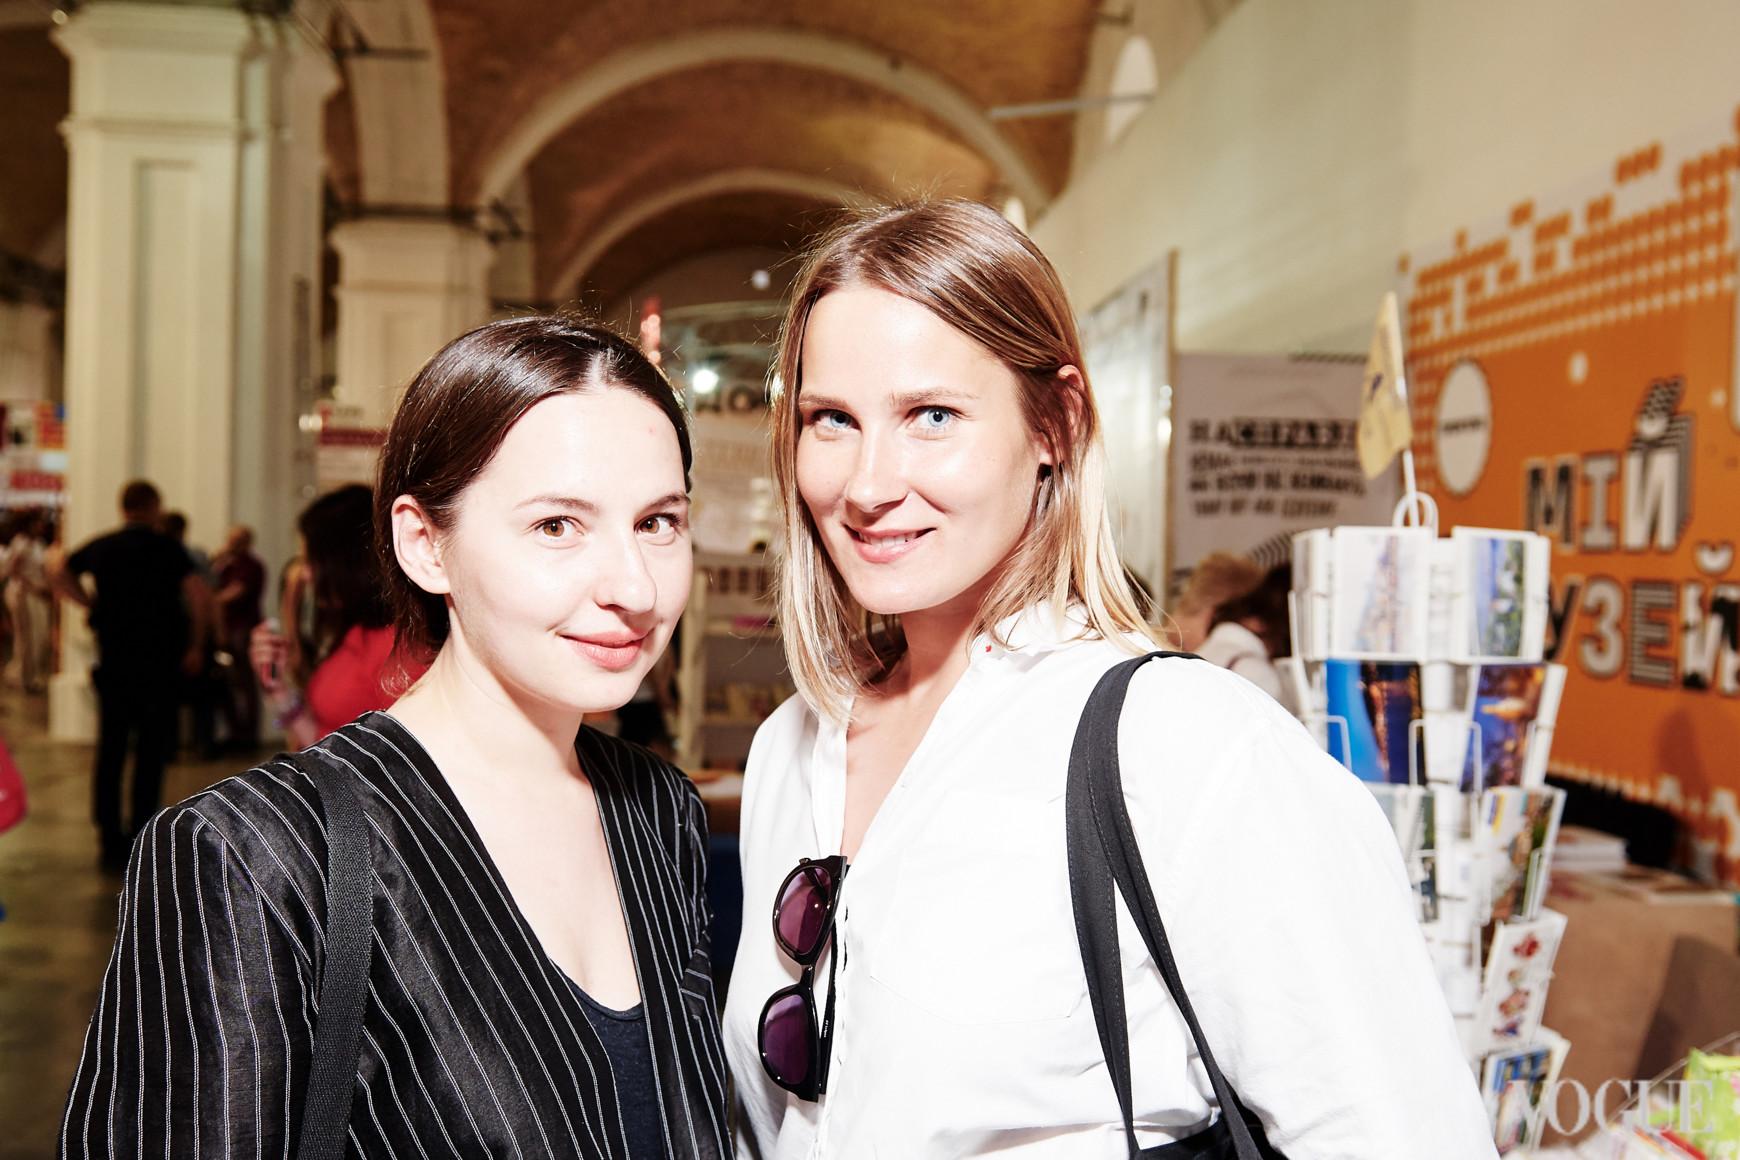 Виолетта Федорова и Полина Митлошук